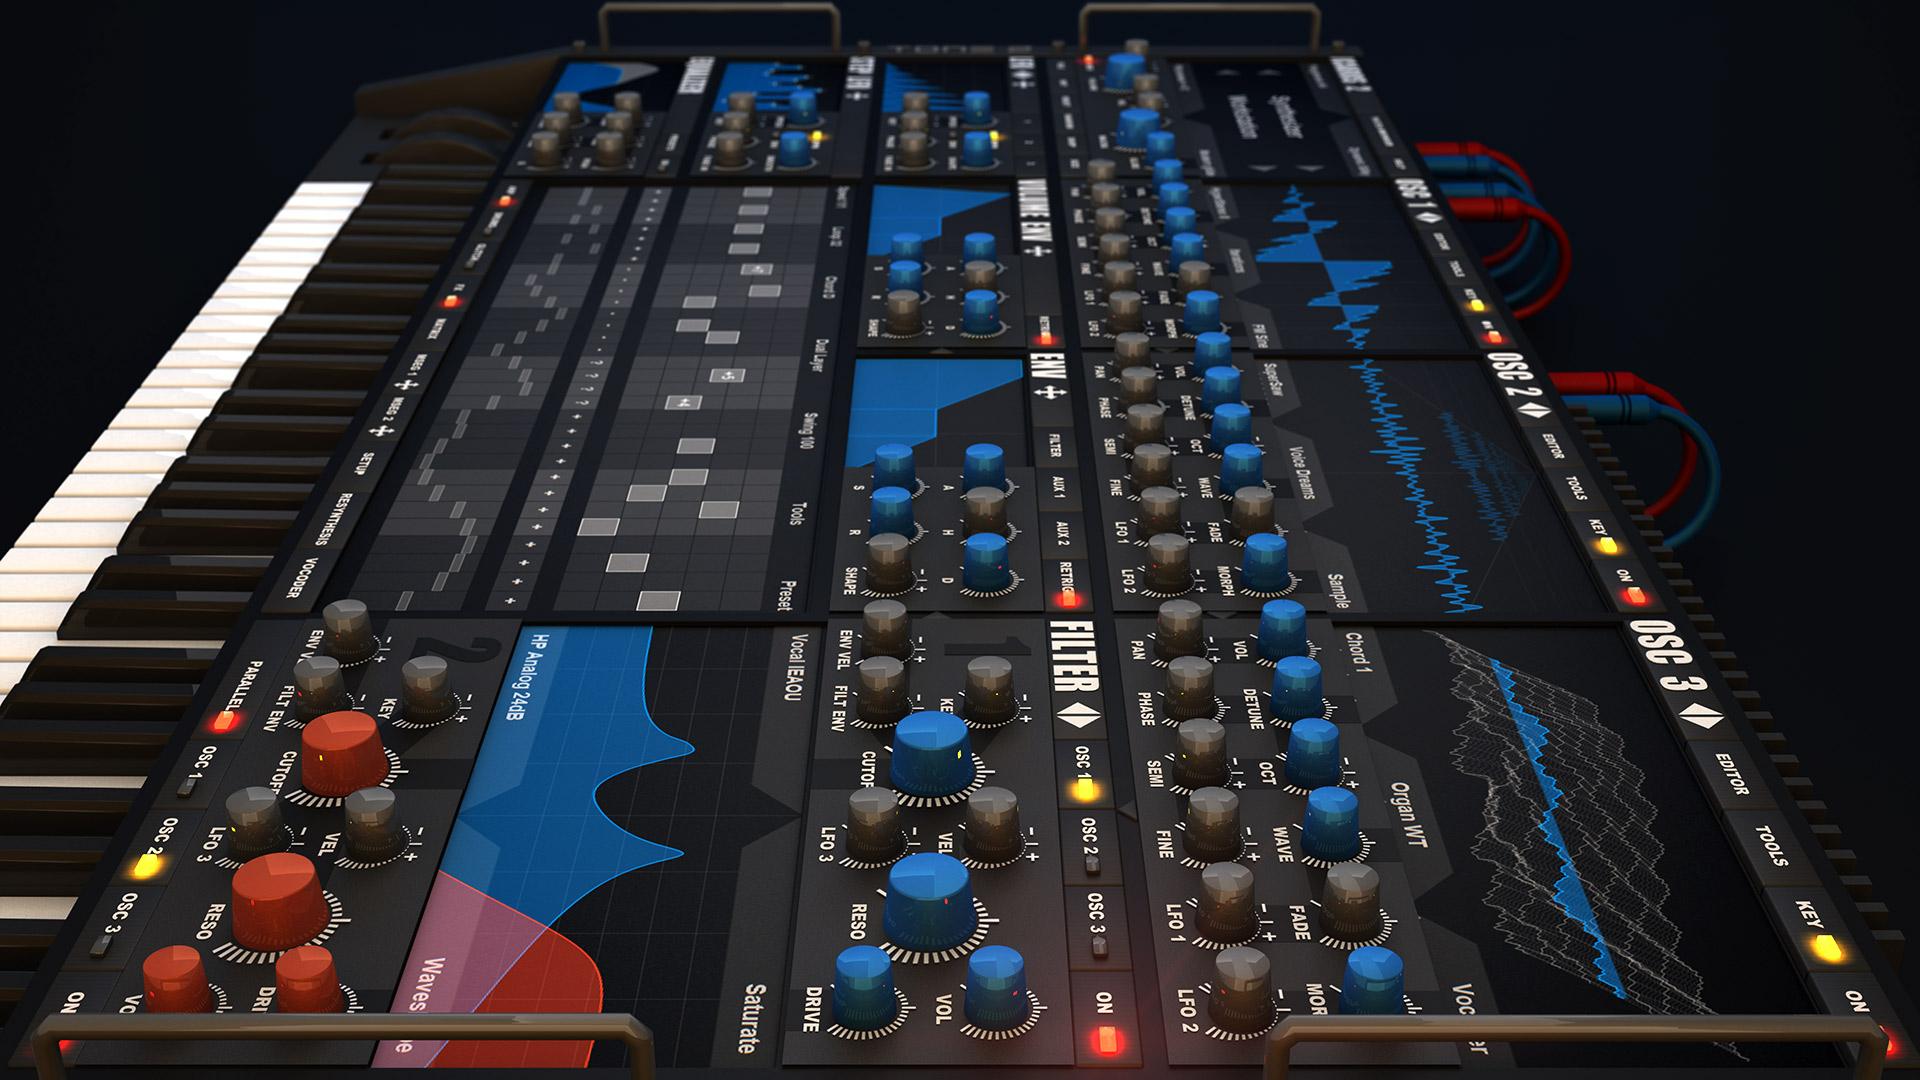 KVR: Icarus2 by Tone2 Audiosoftware - Workstation VST Plugin